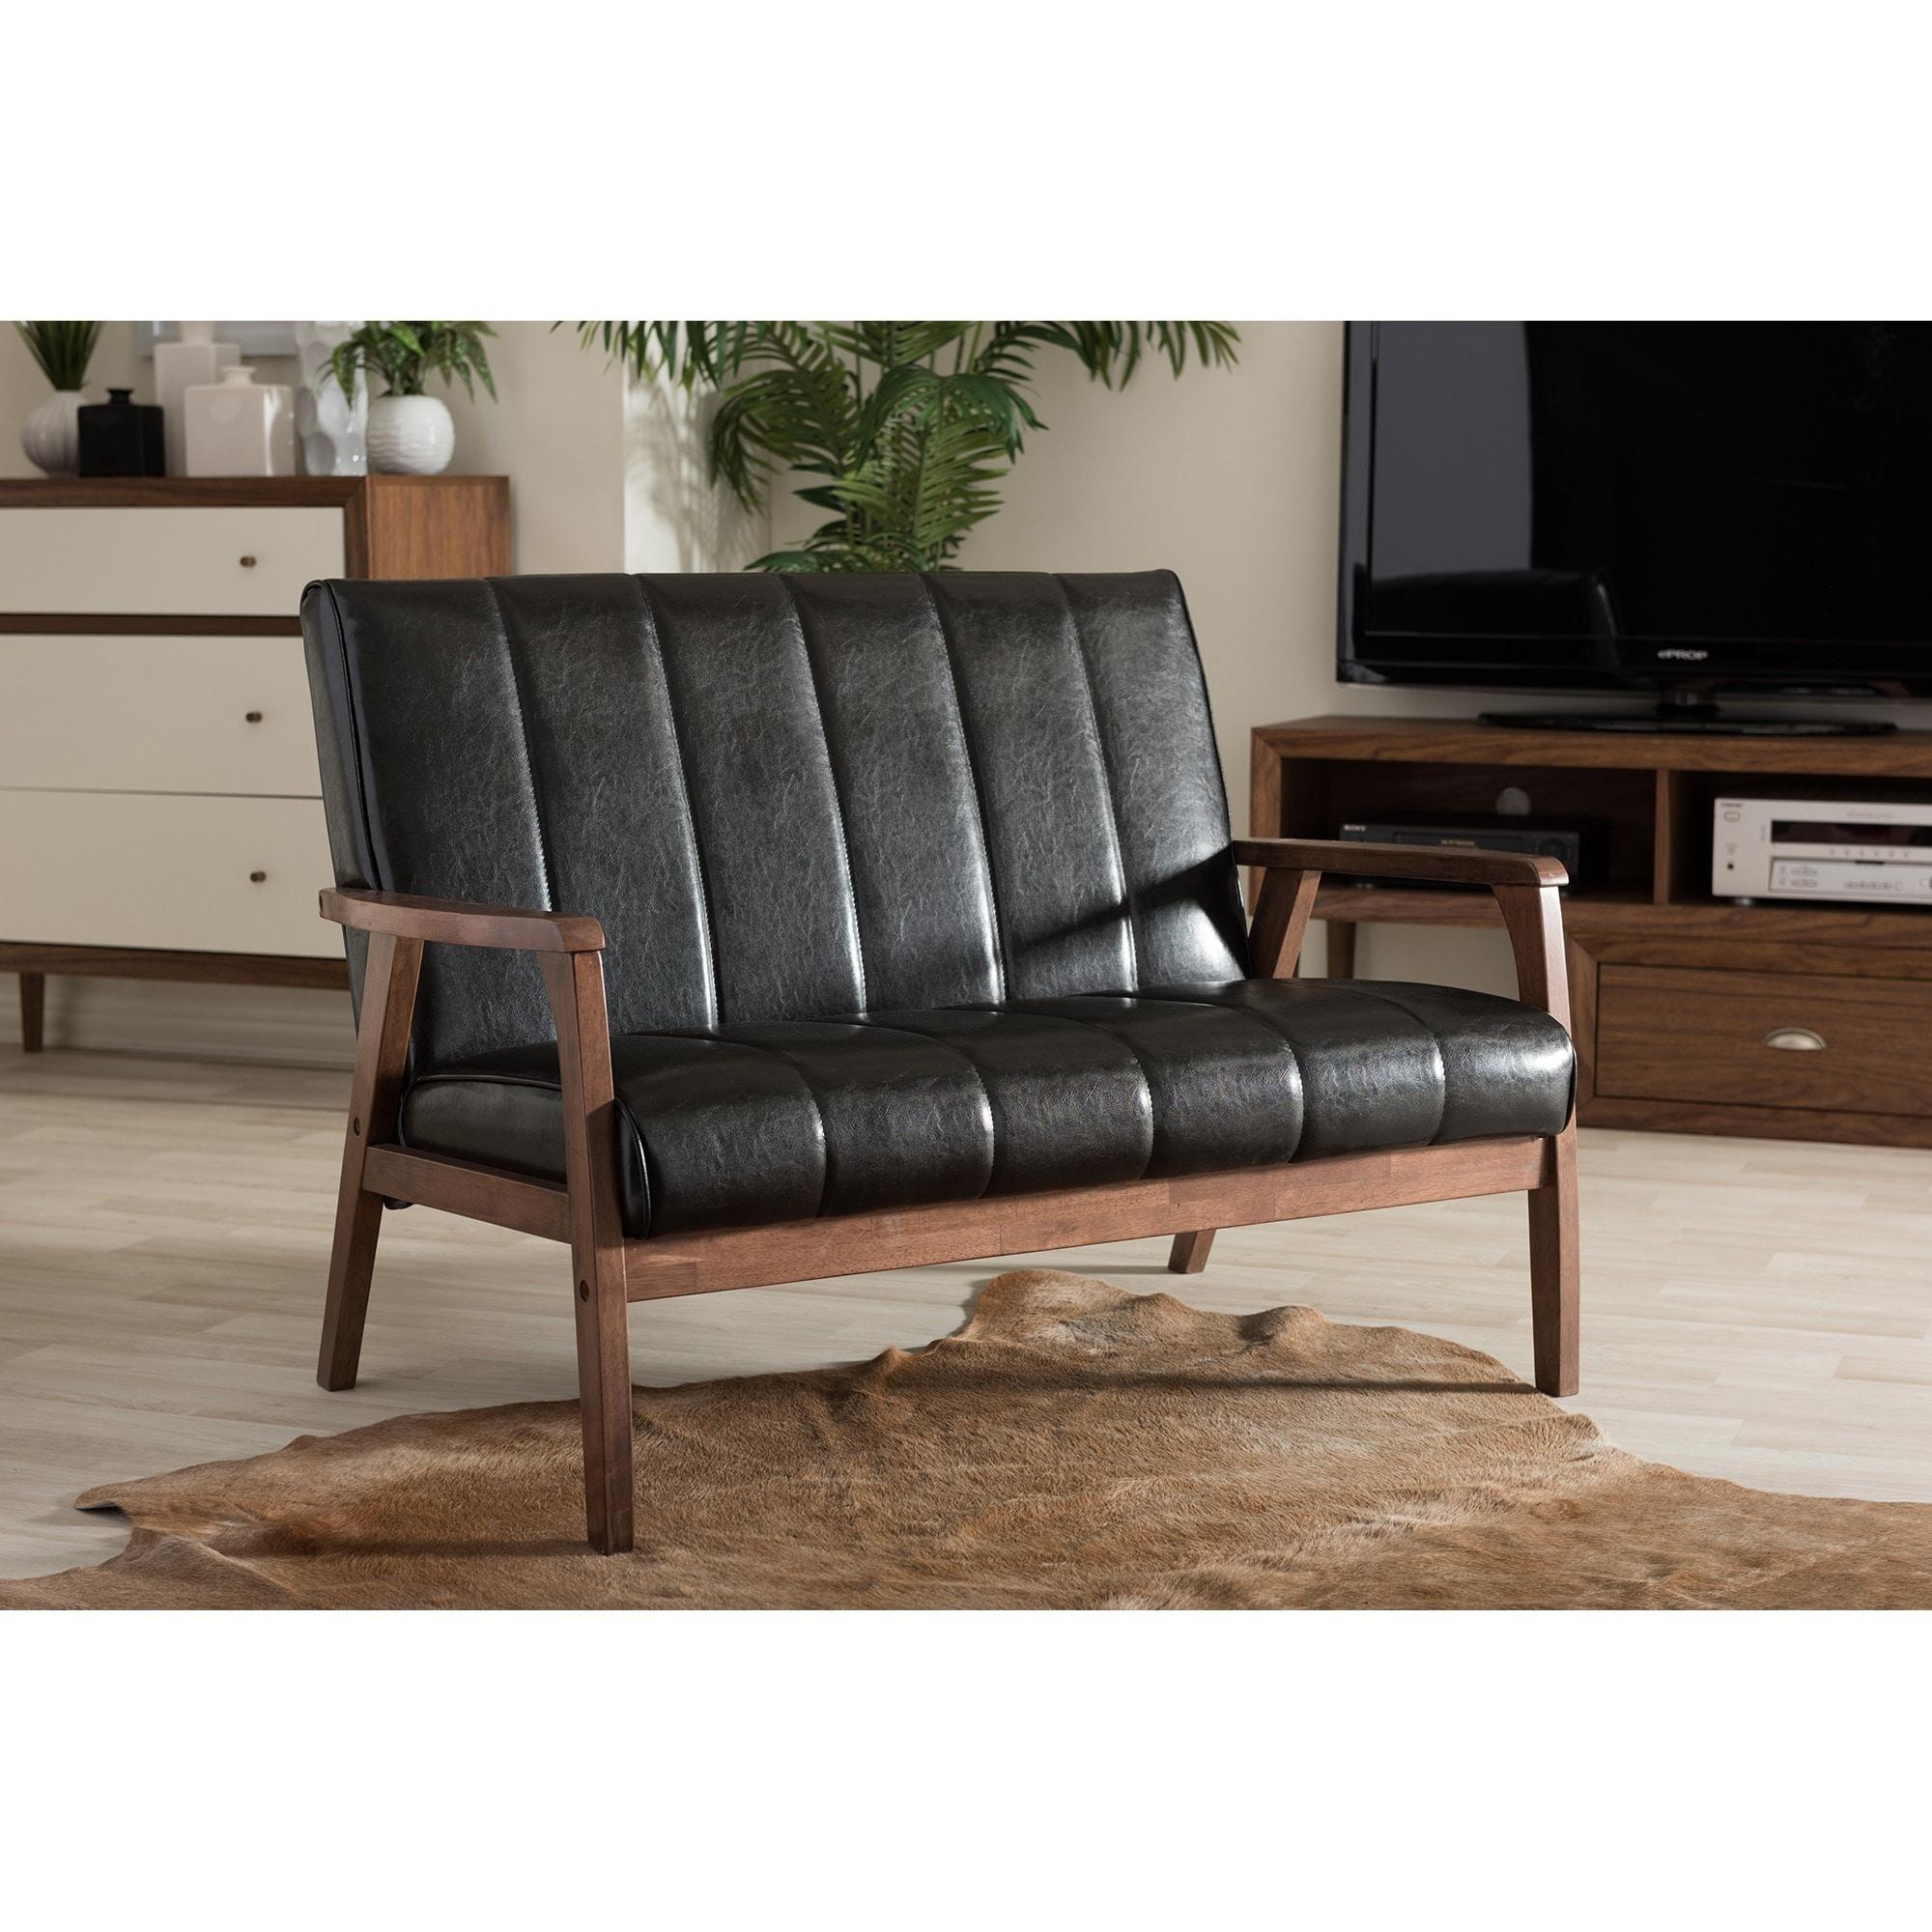 Fabulous Details About Baxton Studio Nikko Mid Century Modern Scandinavian Style Black Creativecarmelina Interior Chair Design Creativecarmelinacom